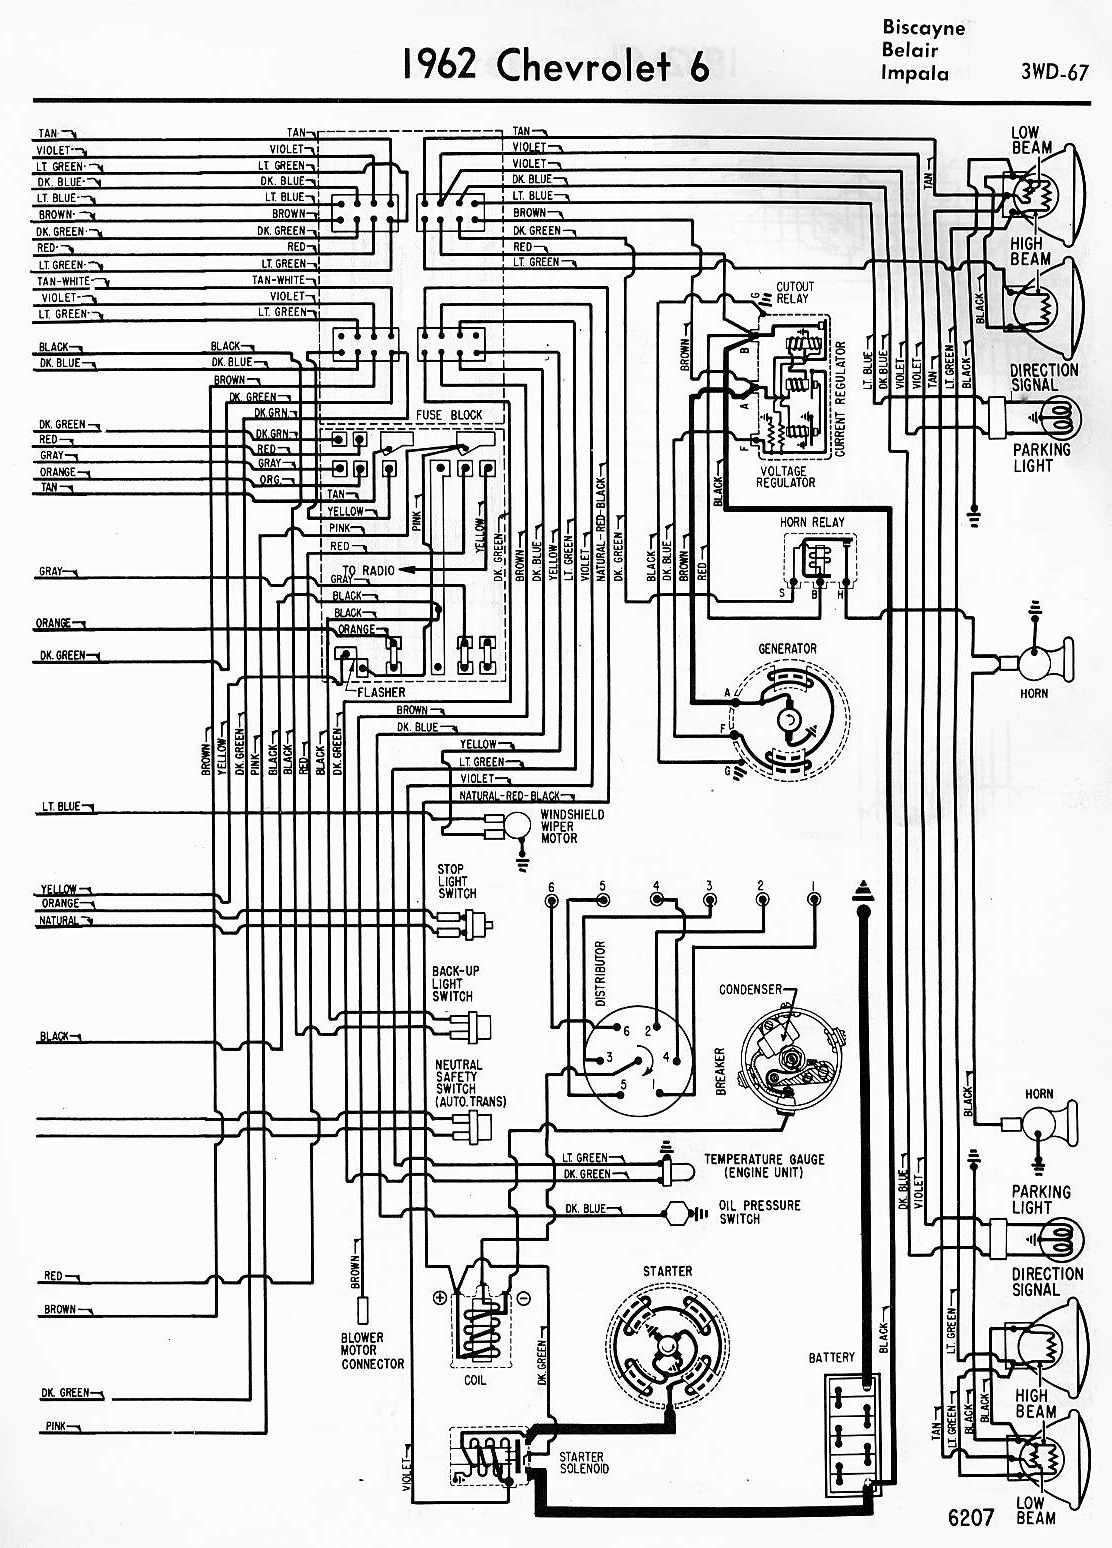 1958 apache wiring diagram fluorescent ballast wiring diagram series, Wiring diagram